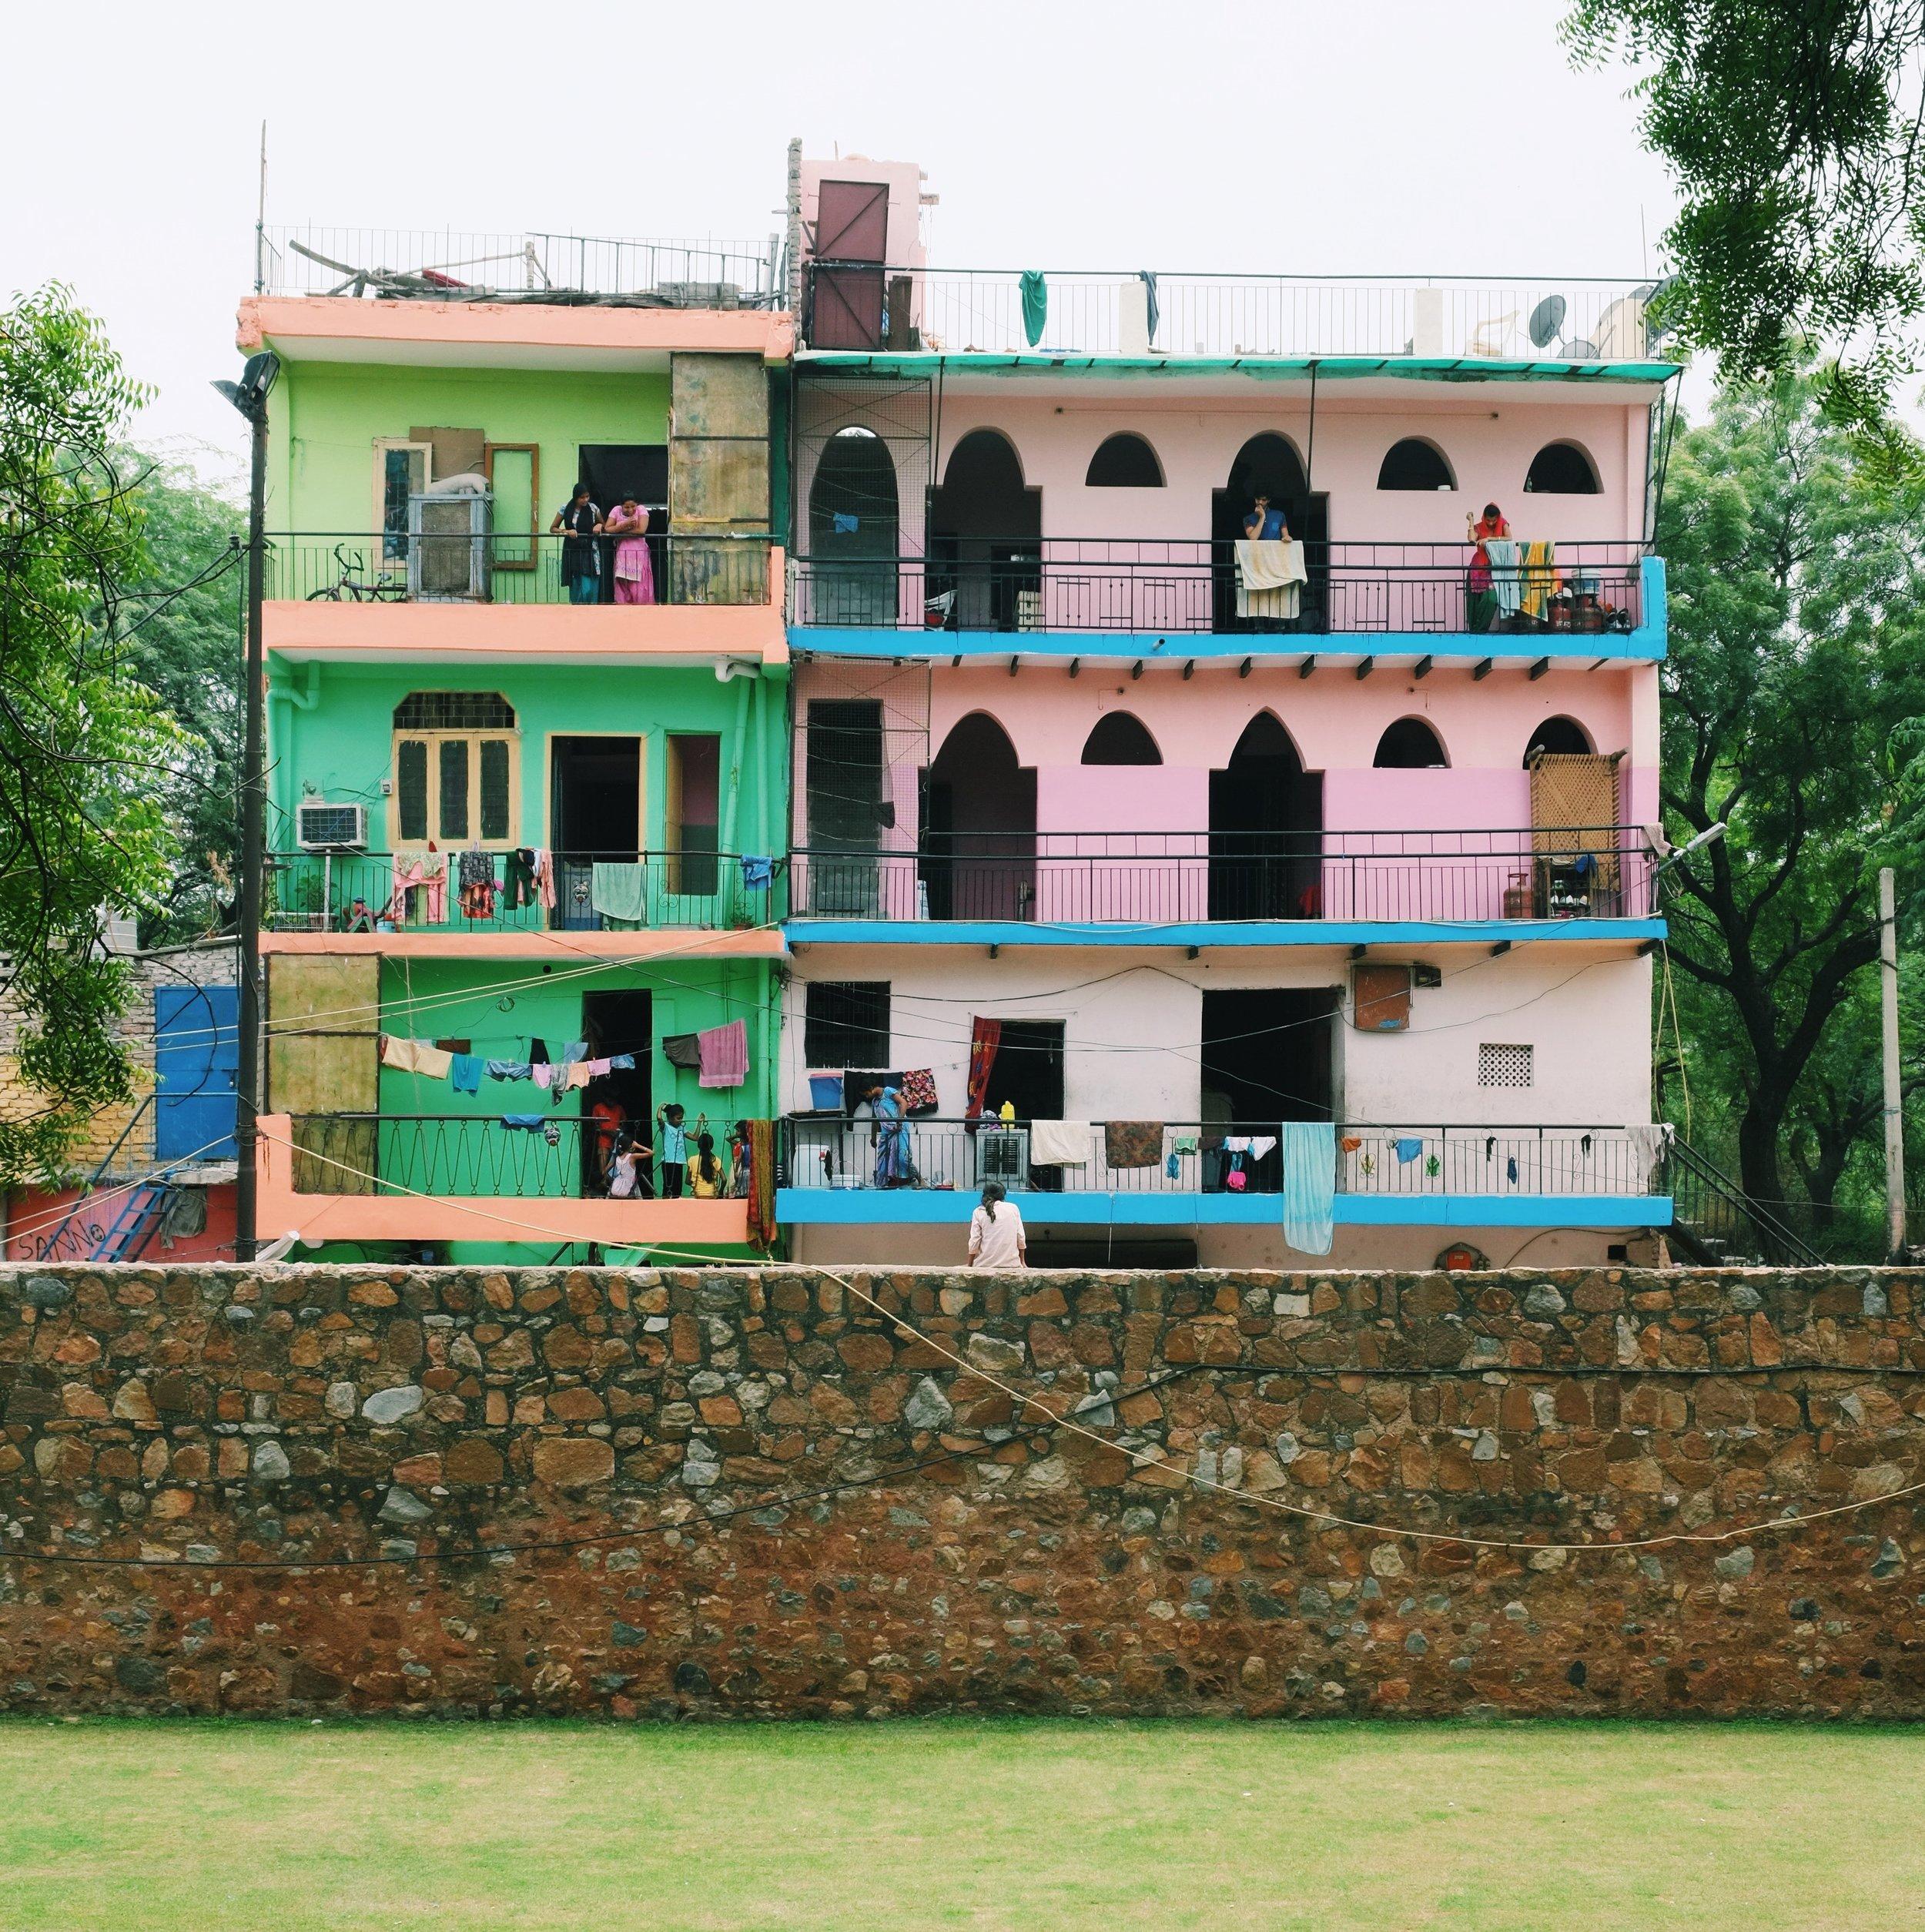 Hauz Khas house New Delhi India Joost Bastmeijer.jpeg